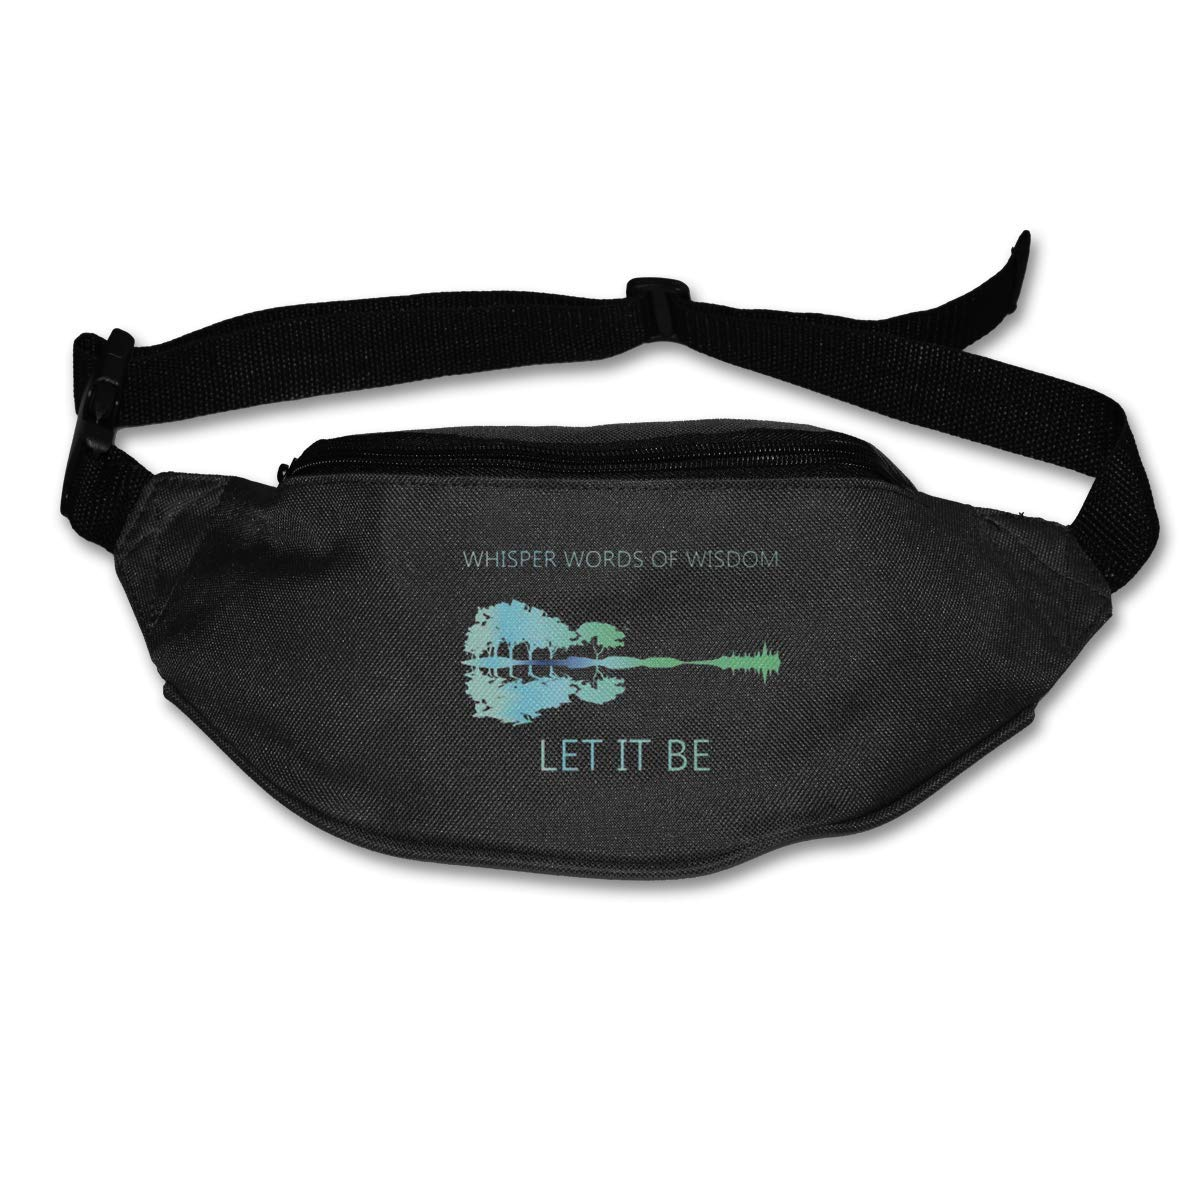 Whisper Words of Wisdom Let It Be Guitar Lake Shadow Pack Waist Bag Travel